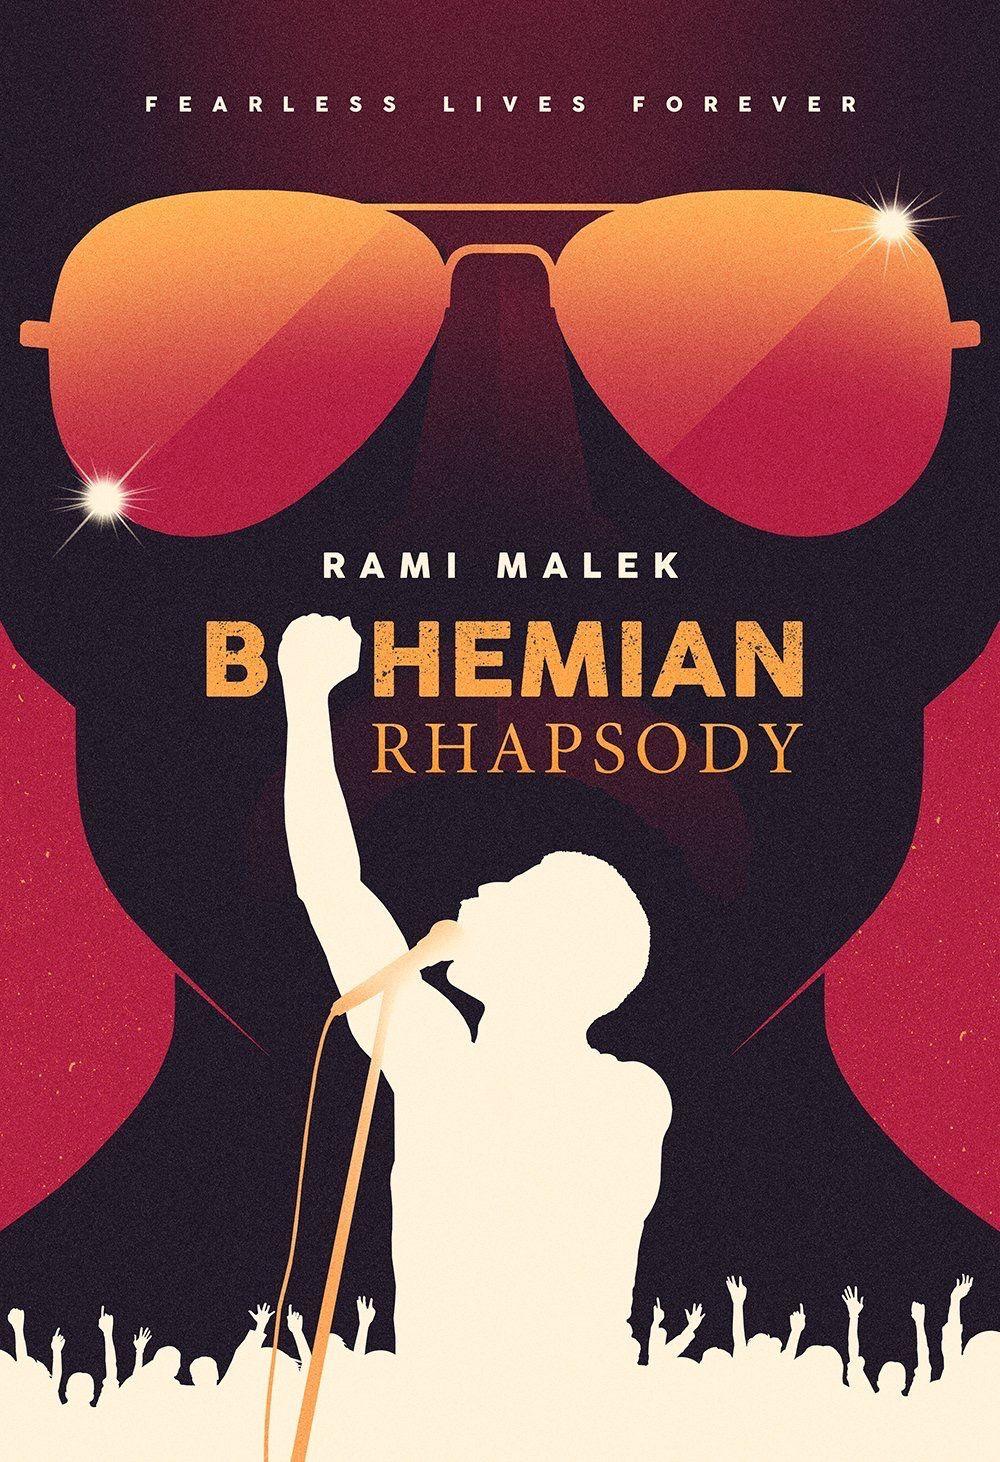 Hasil gambar untuk BOHEMIAN RHAPSODY poster